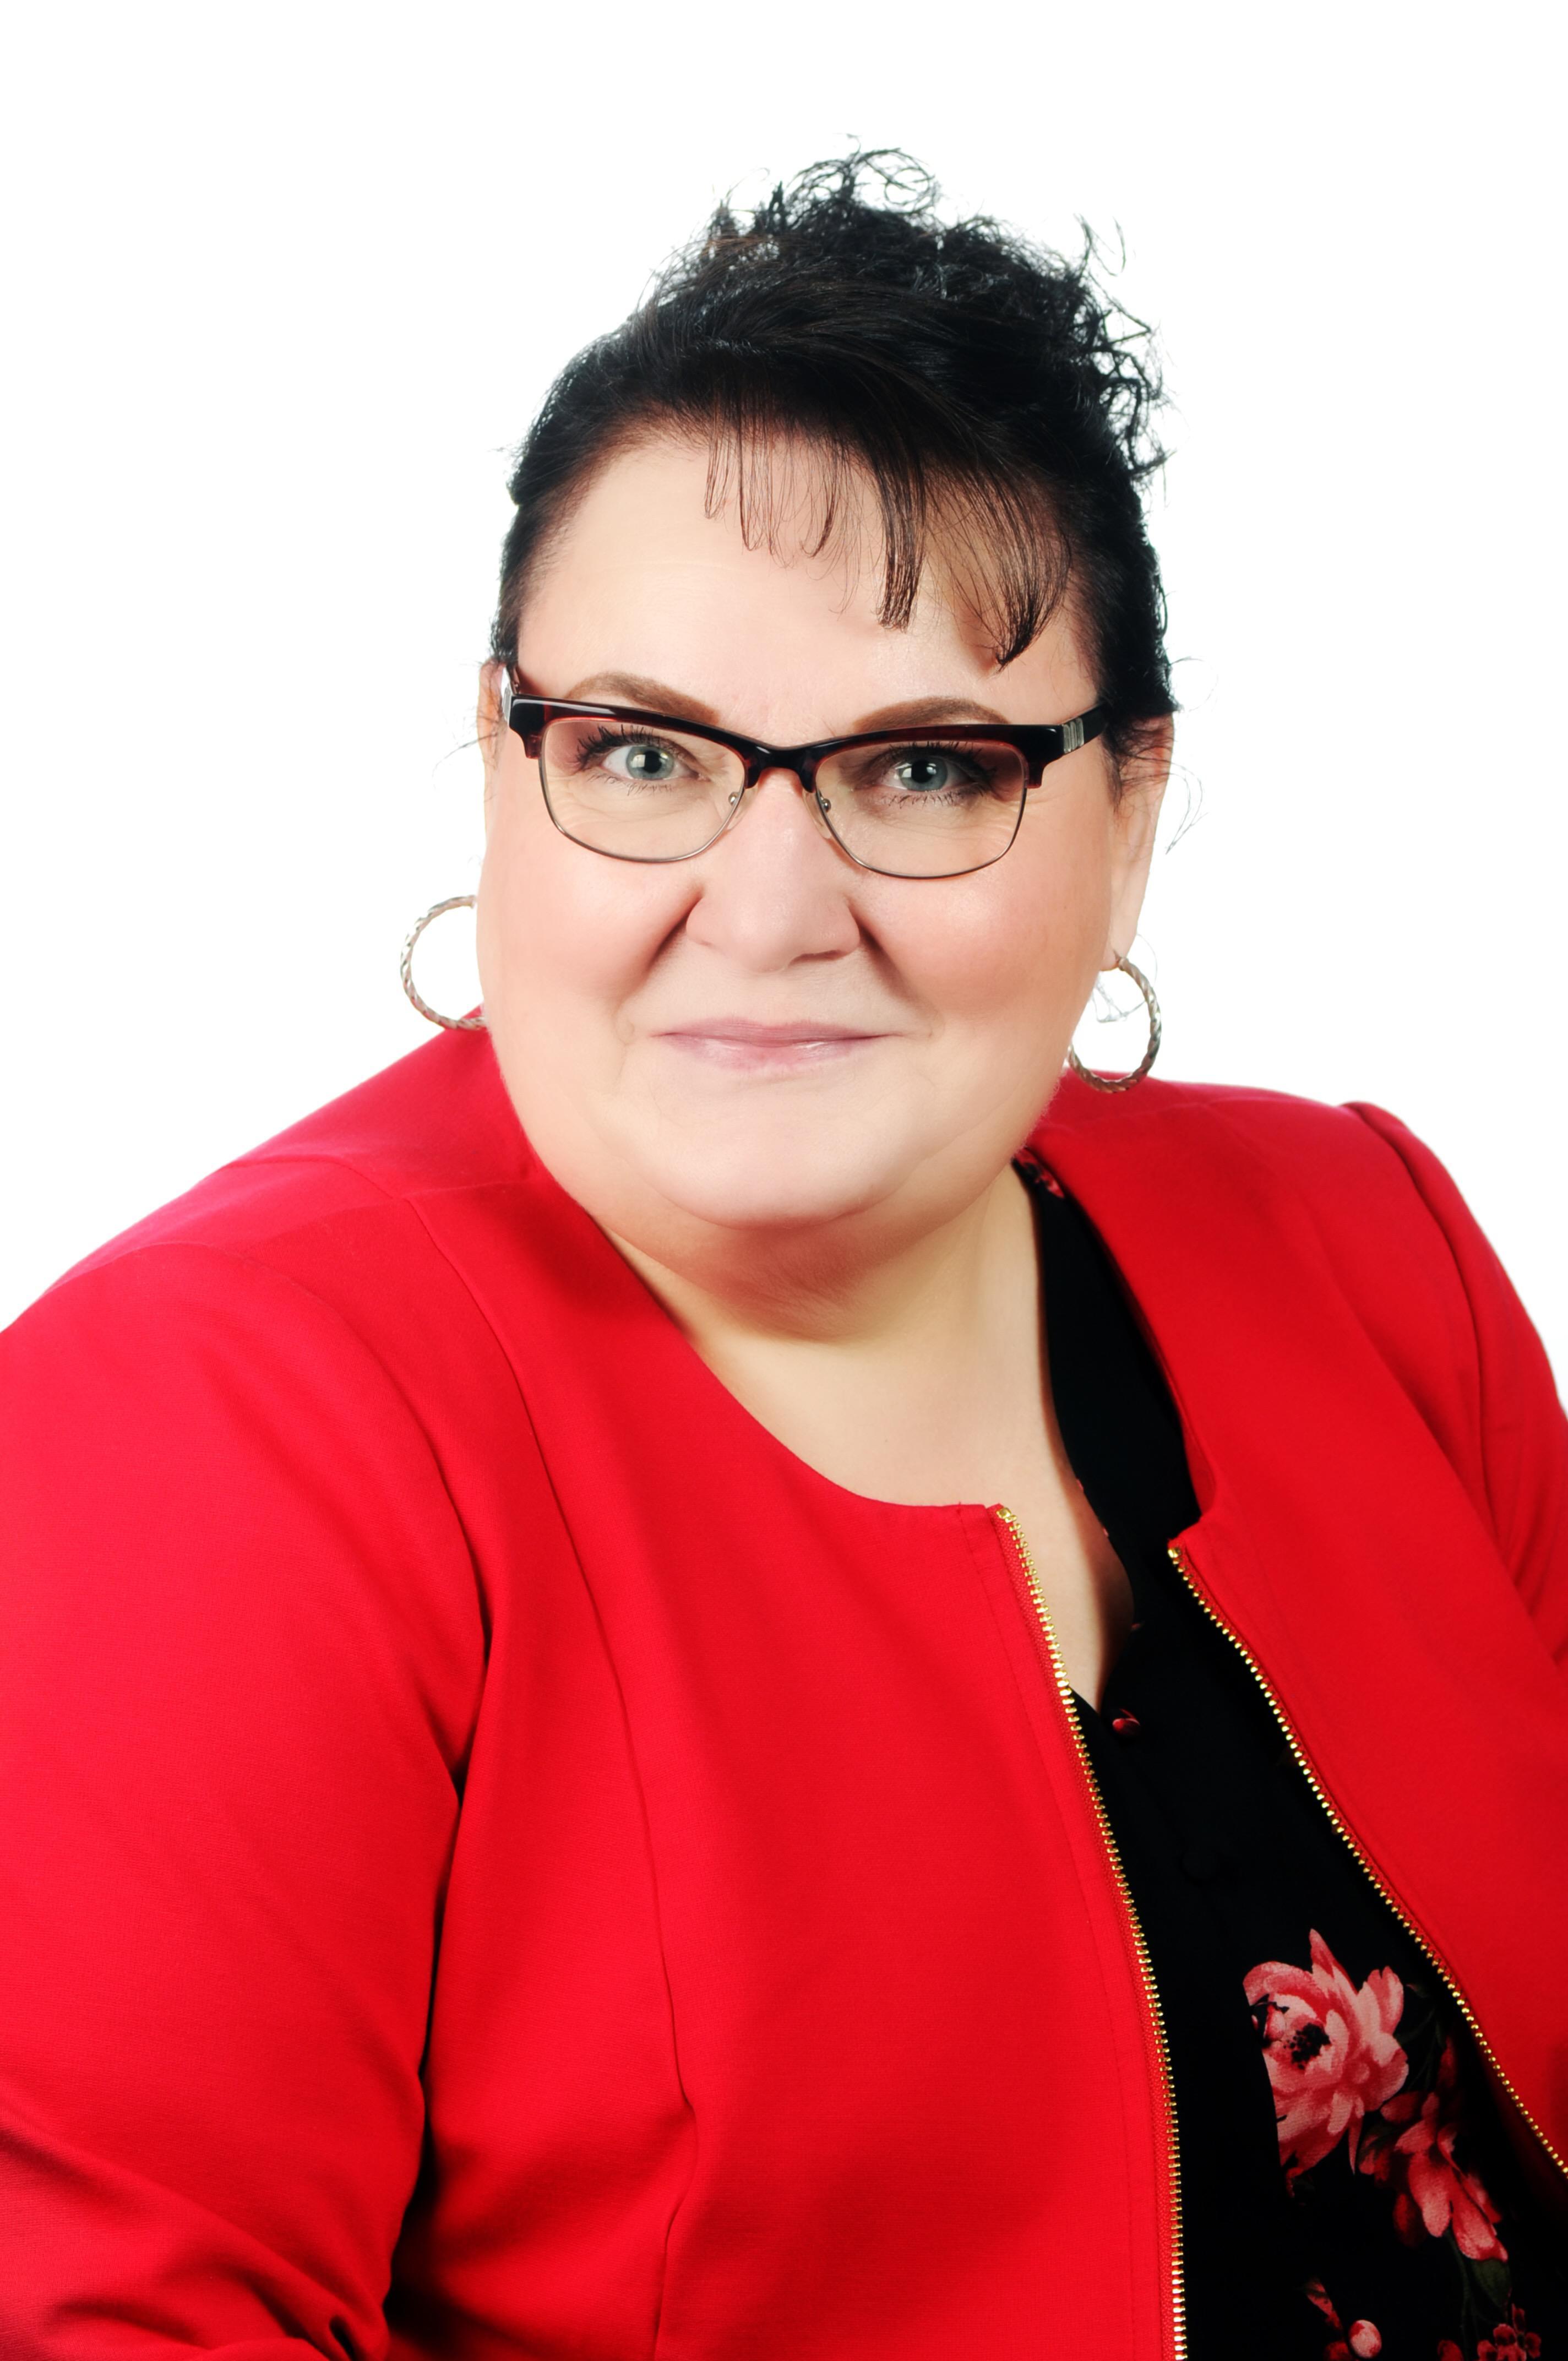 Terri McClinton, Bankers Life Agent and Bankers Life Securities Financial Representative - Williamsport, PA 17701 - (570)980-2942 | ShowMeLocal.com